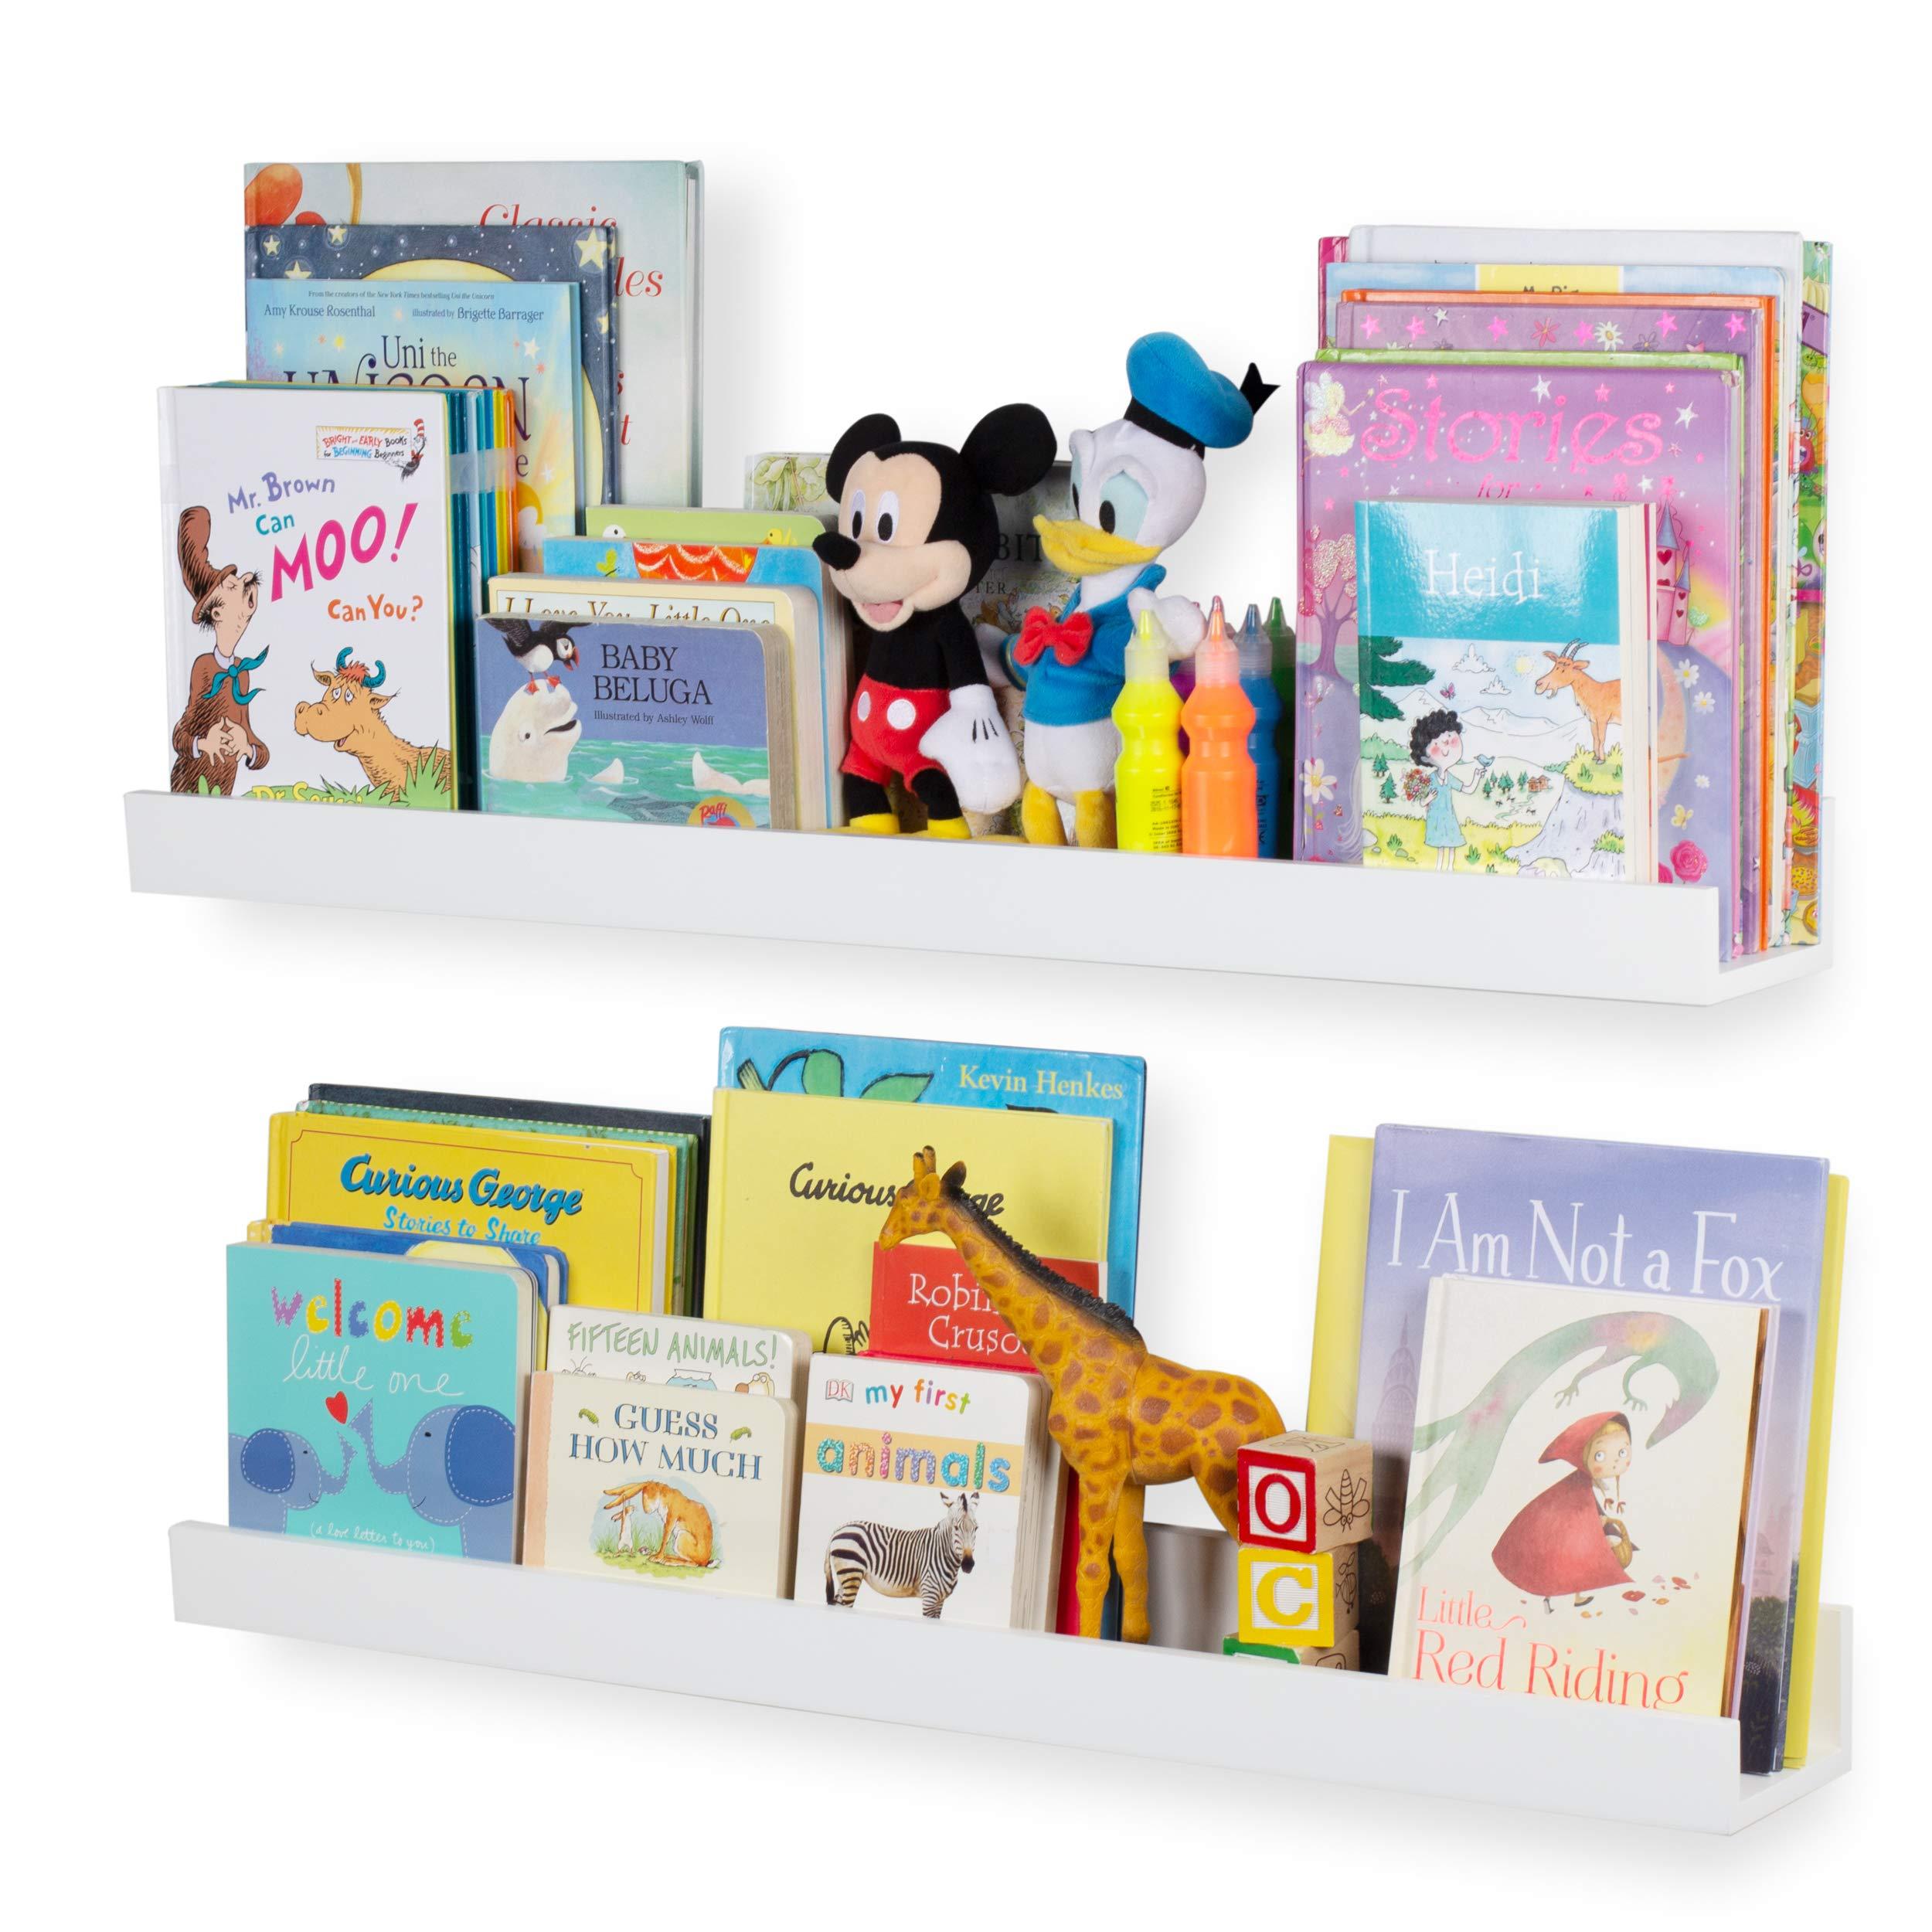 Wallniture Denver Wall Mount Kids Bookshelf | Floating Wall Shelf for Book Display - Wide 34 Inch White Set of 2